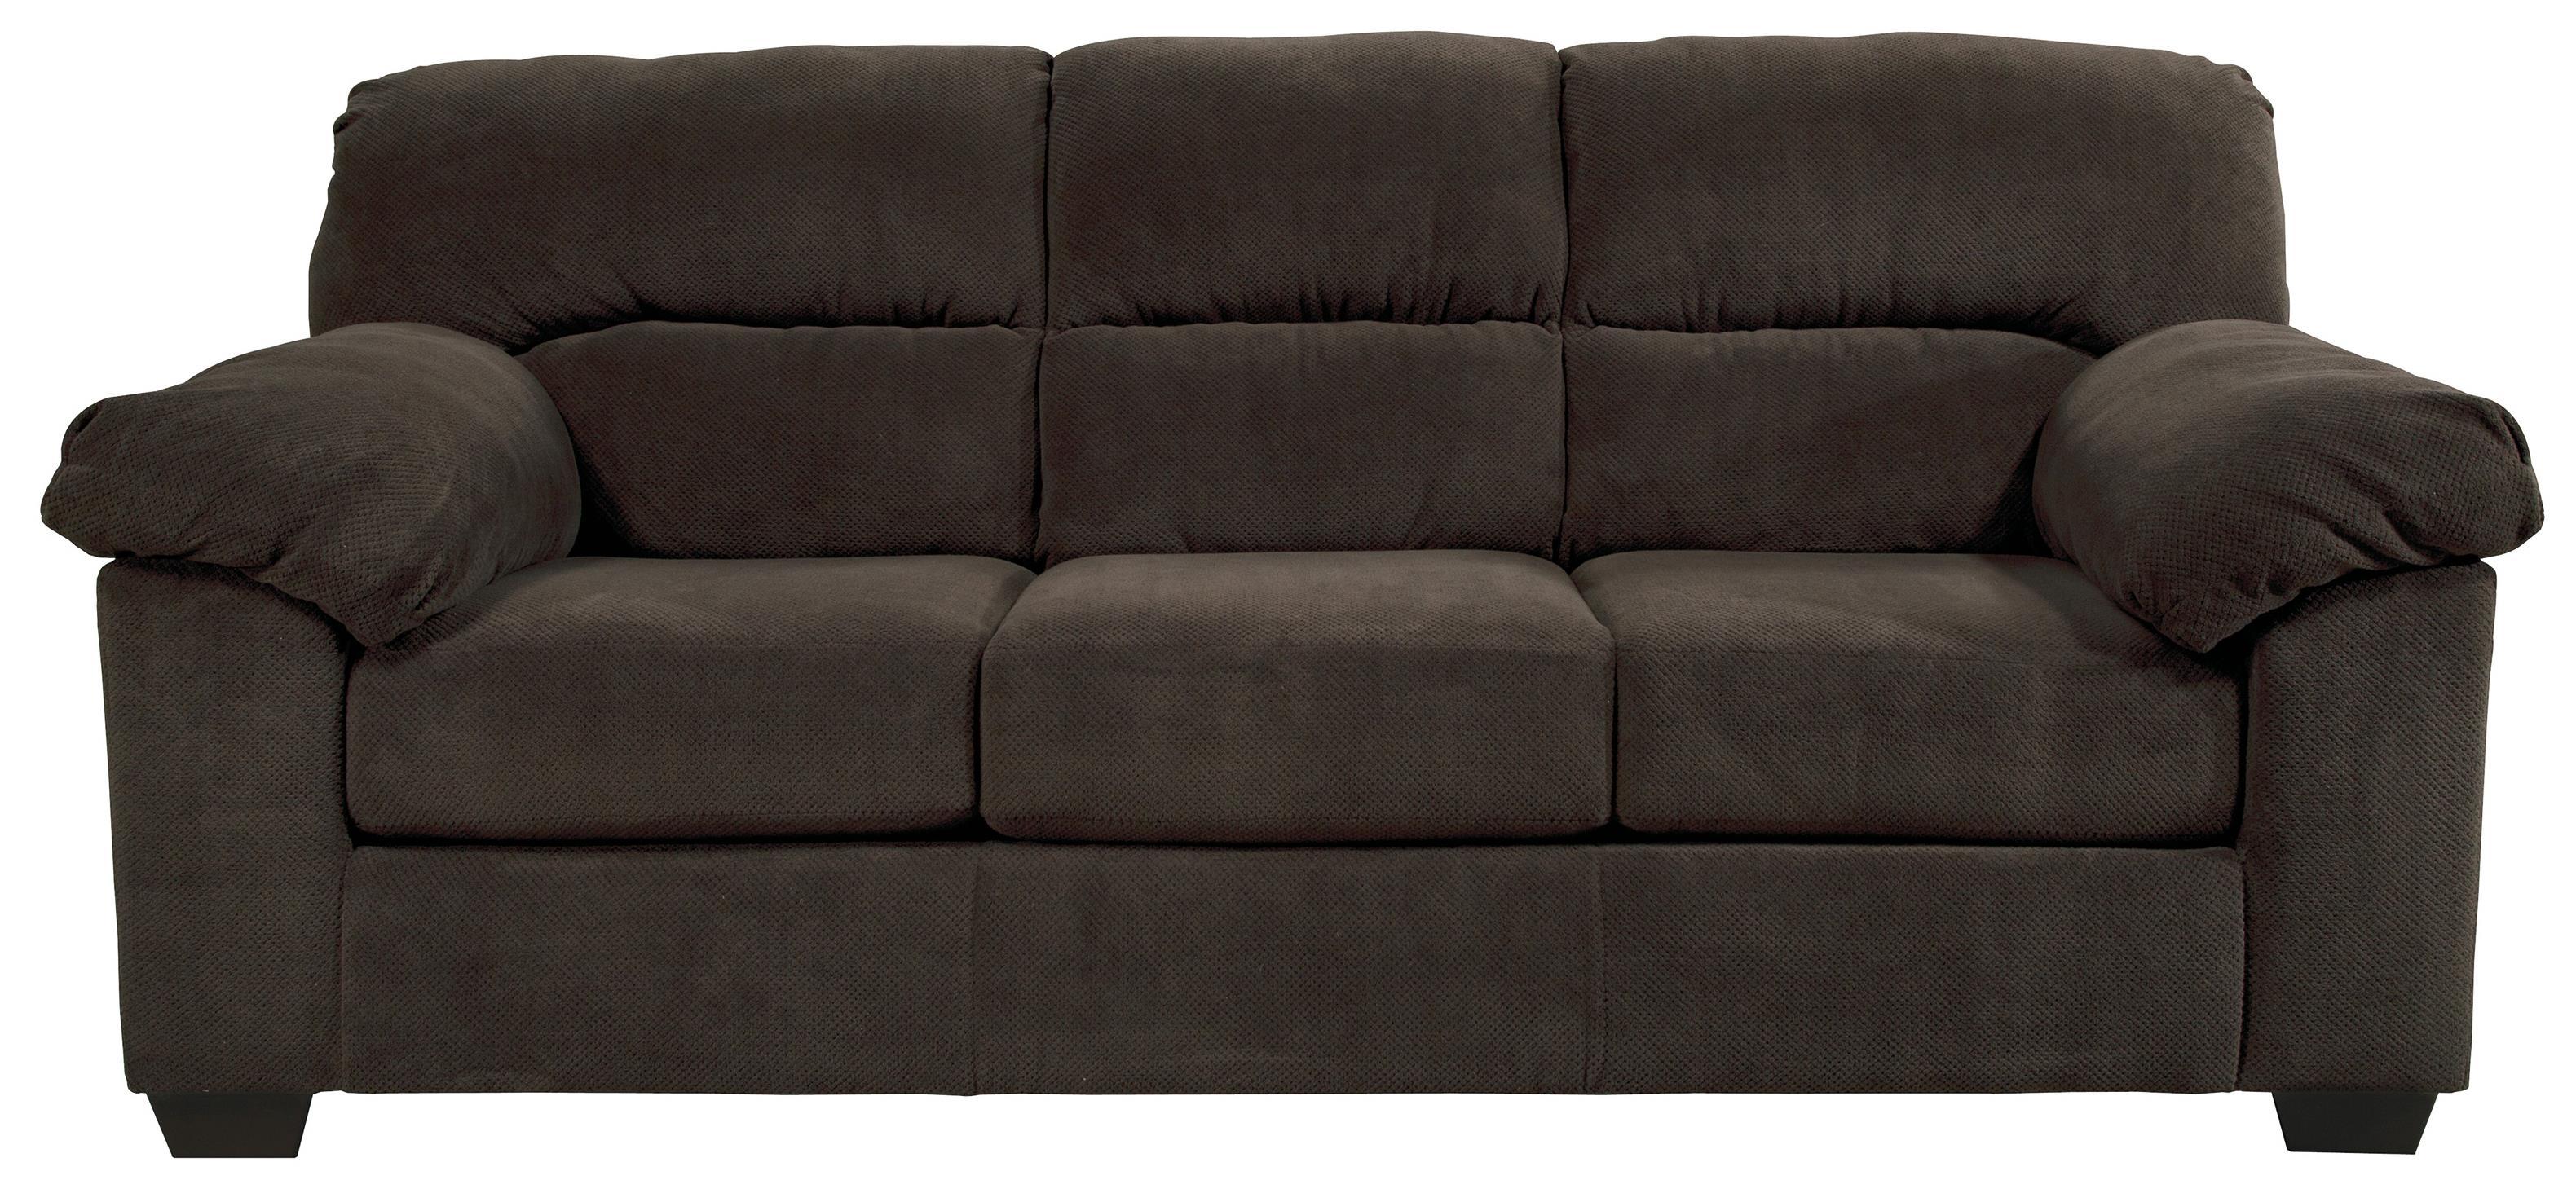 Benchcraft Zorah Full Sofa Sleeper - Item Number: 9450136